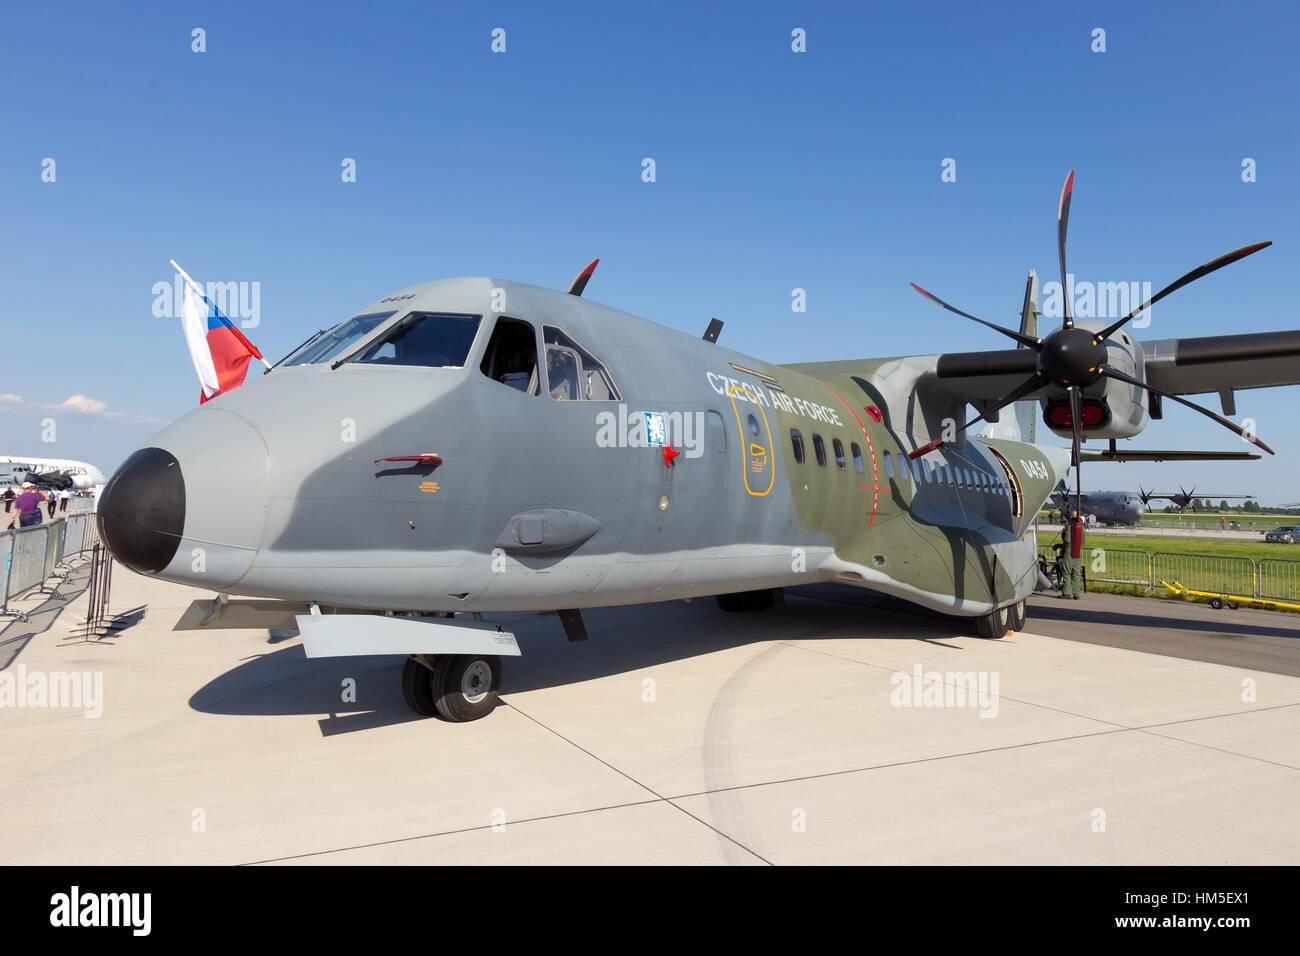 BERLIN, GERMANY MAY 22: Czech Air Force Casa C295M